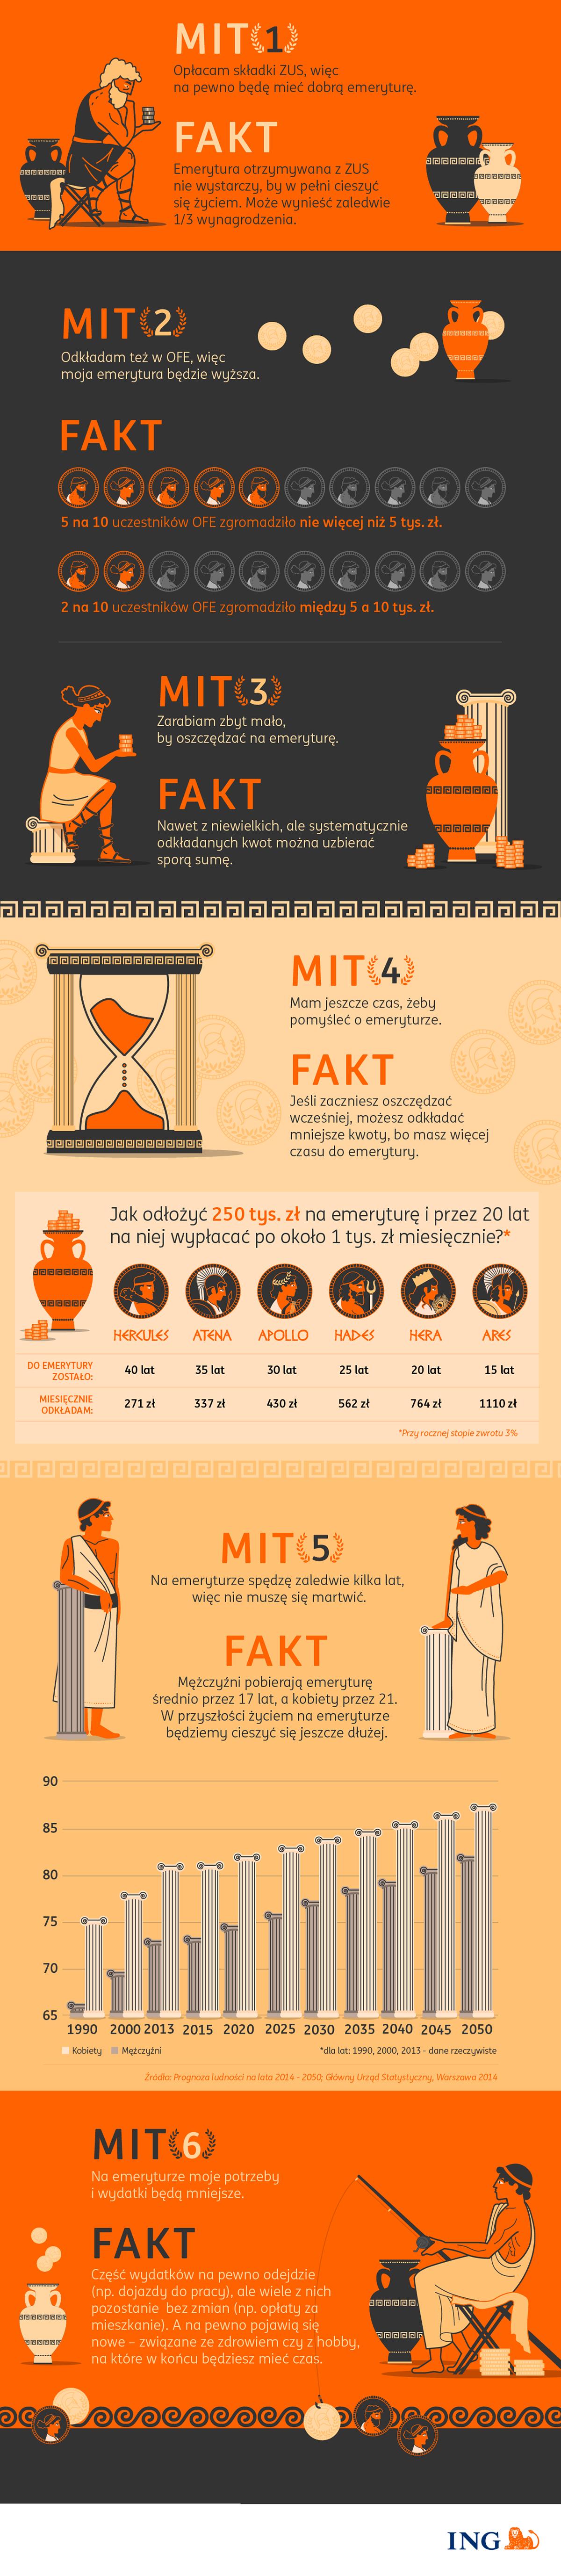 ING - infografika Mitologia emerytalna 2019 10 09 body.png